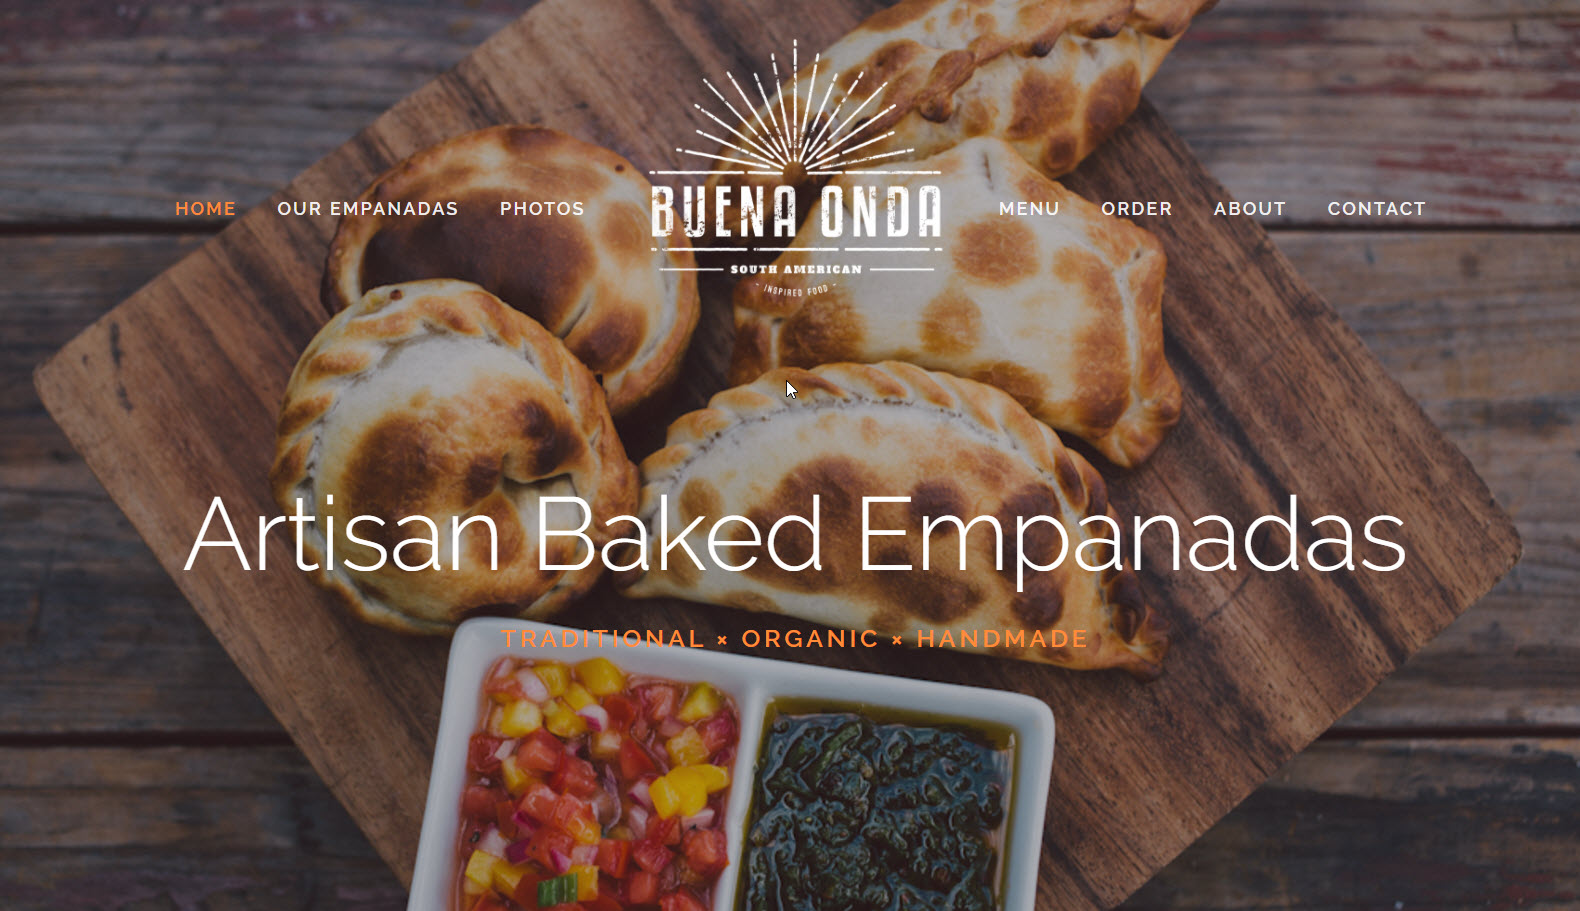 Santa Barbara handmade, fresh baked, authentic Argentinian Empanadas